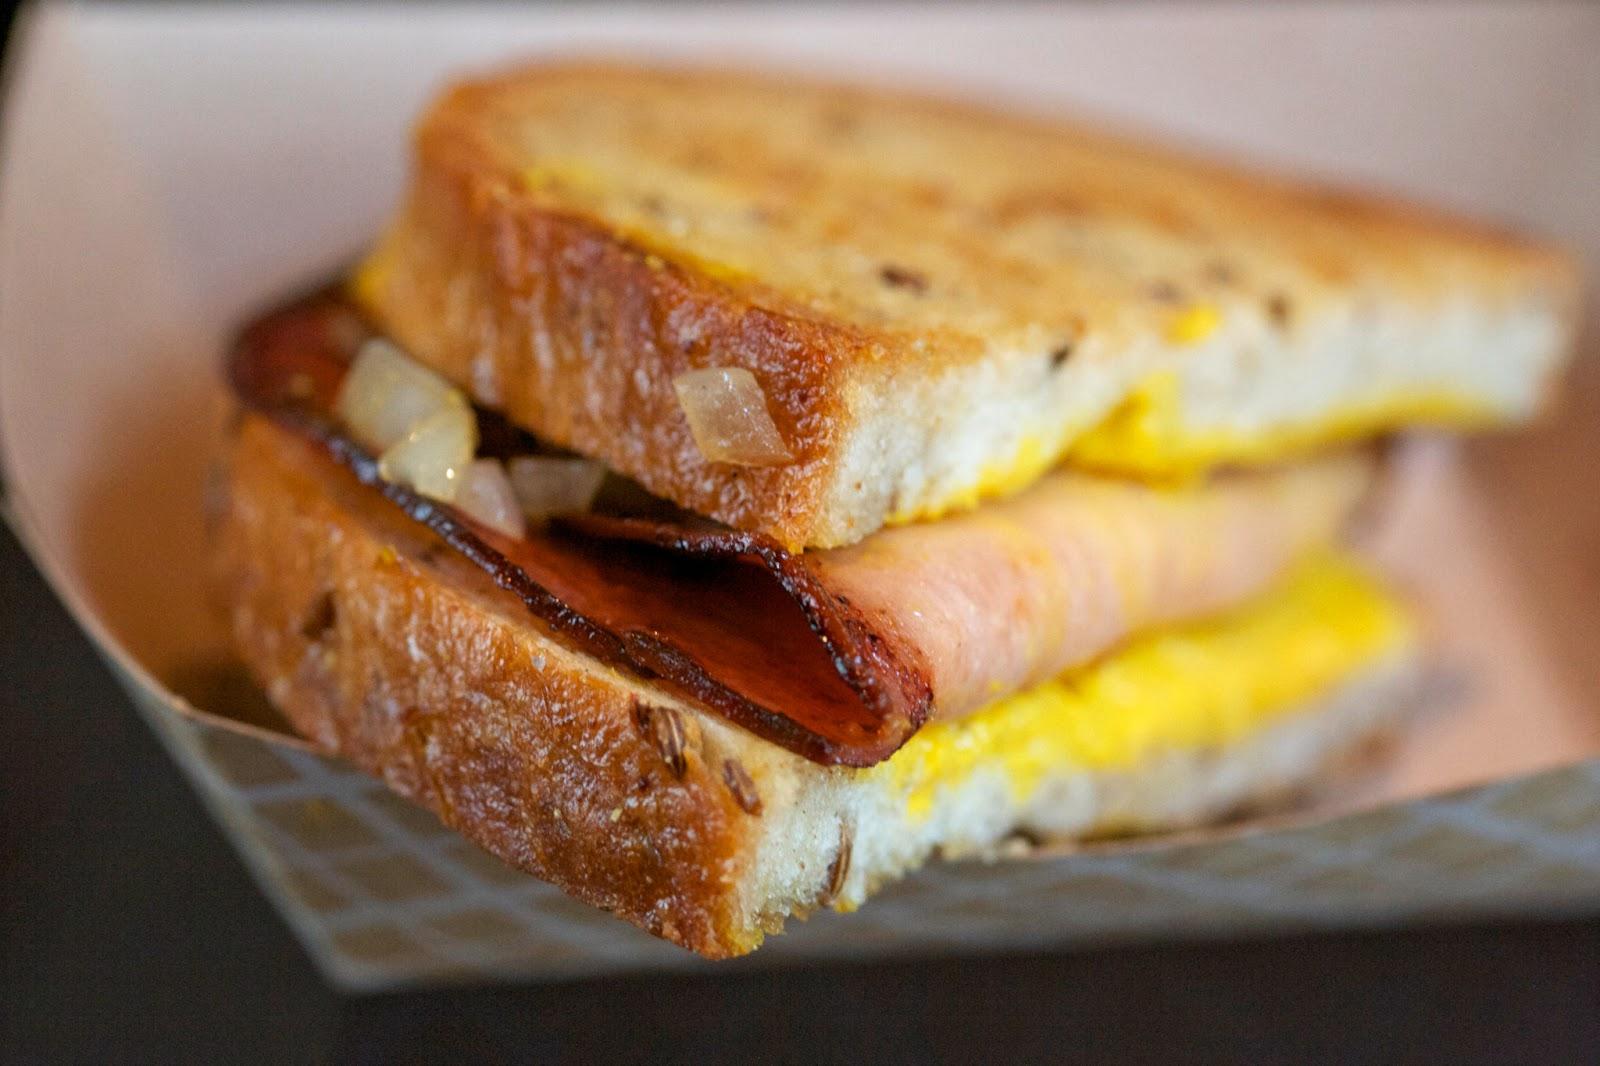 Top 10 Favorite Sandwiches